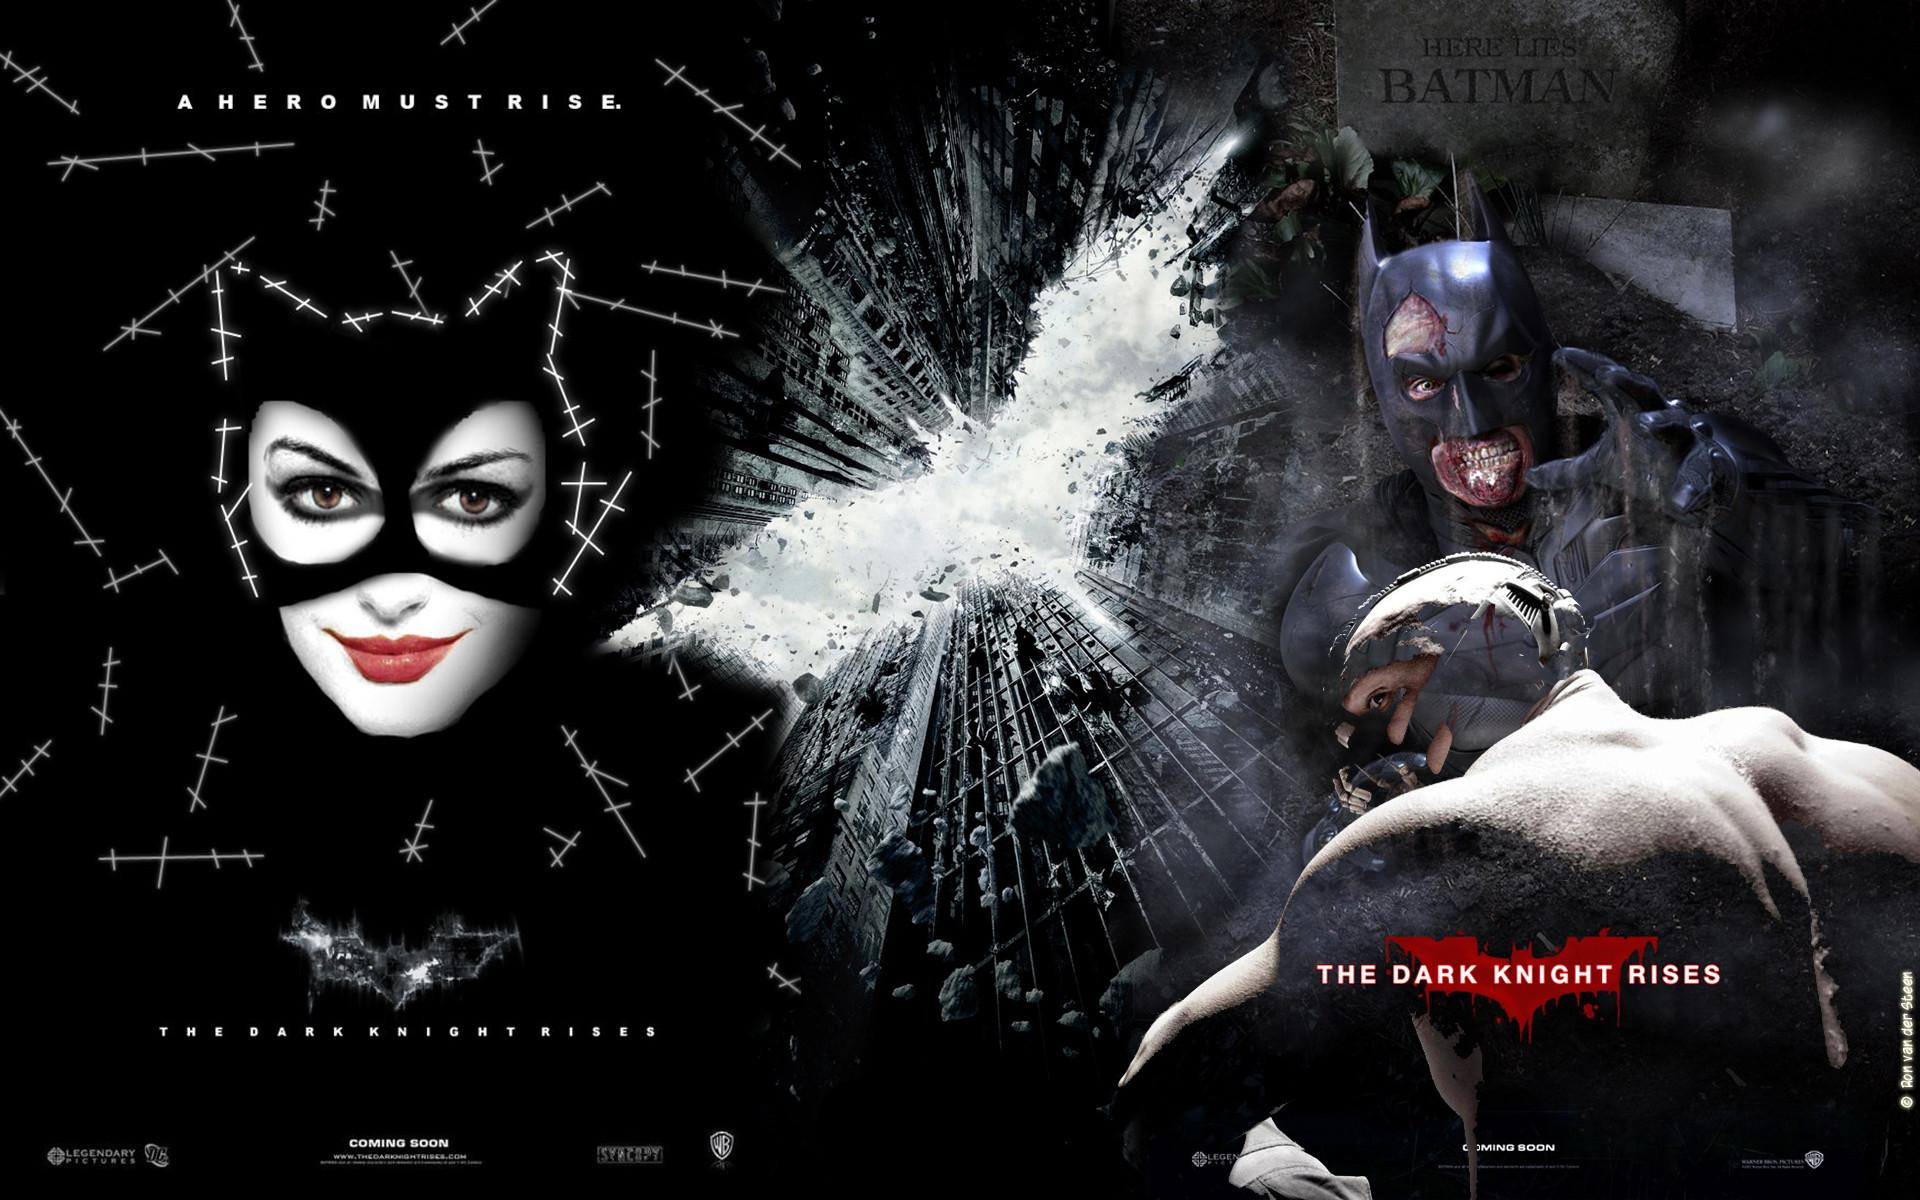 Batman, The Dark Knight Rises wallpapers and stock photos